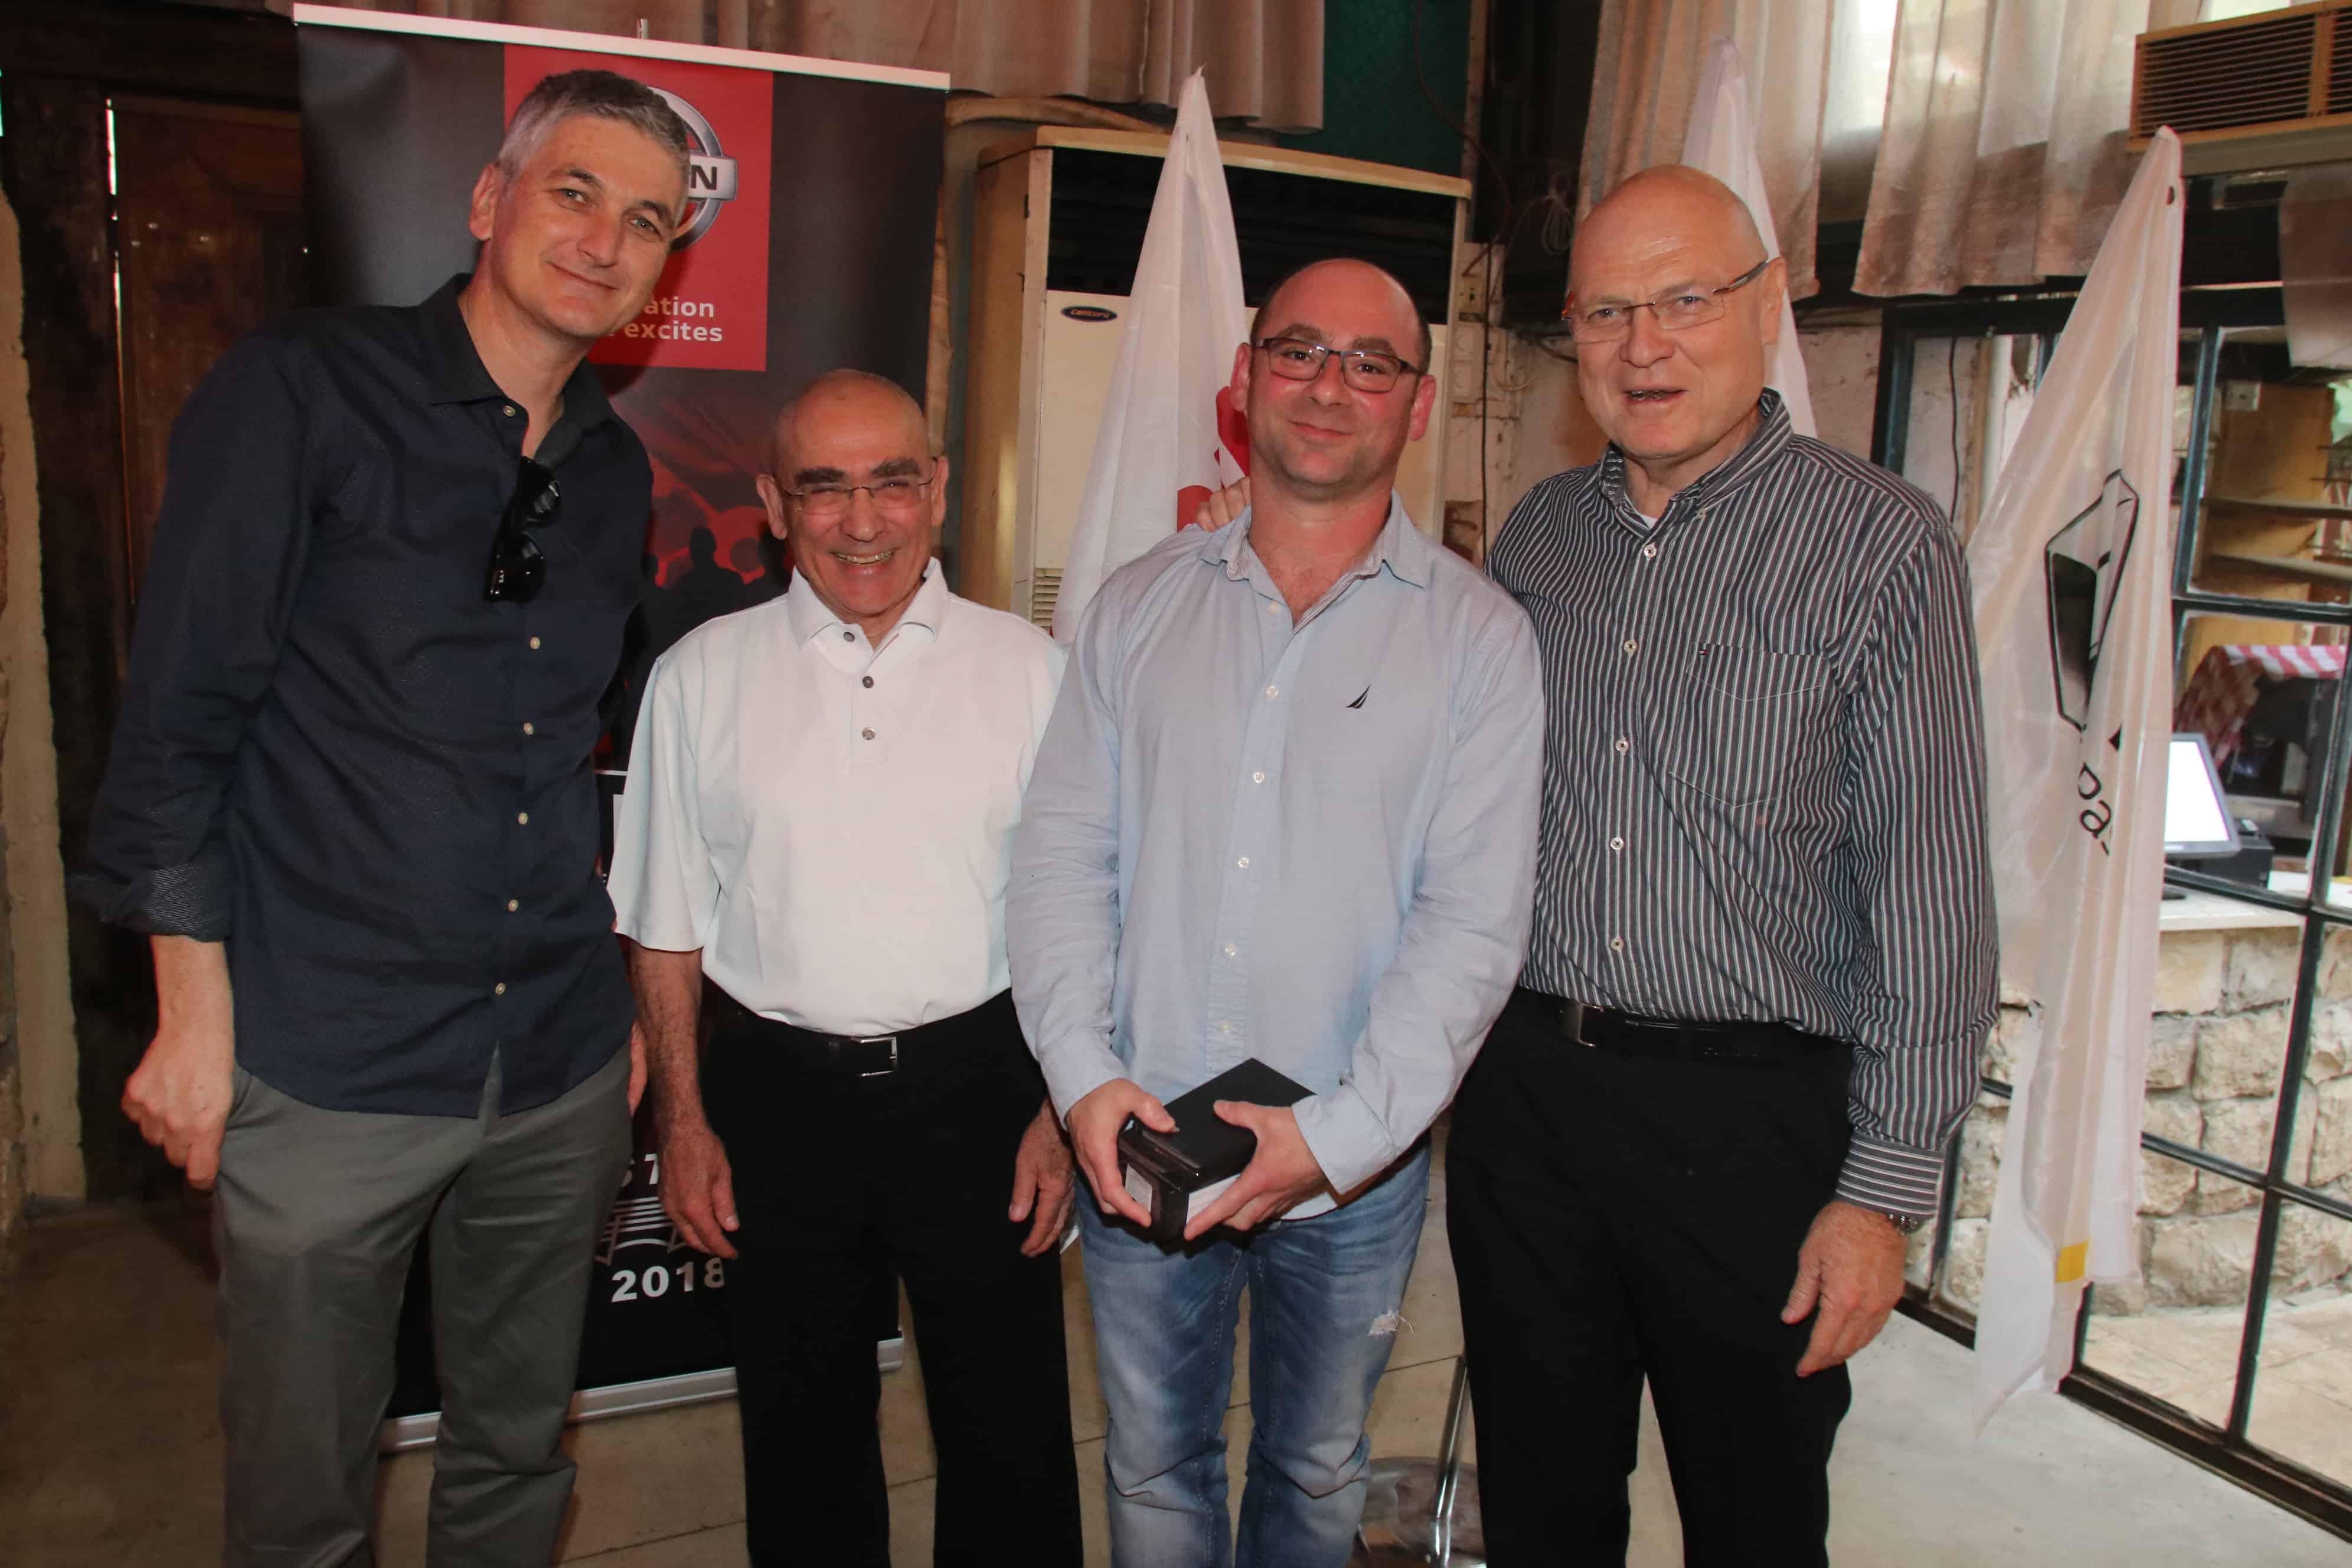 איציק וייצ, הזוכה ליאון מינקין, יואל קרסו ואסף ספקטור. צילום- ניר פקין